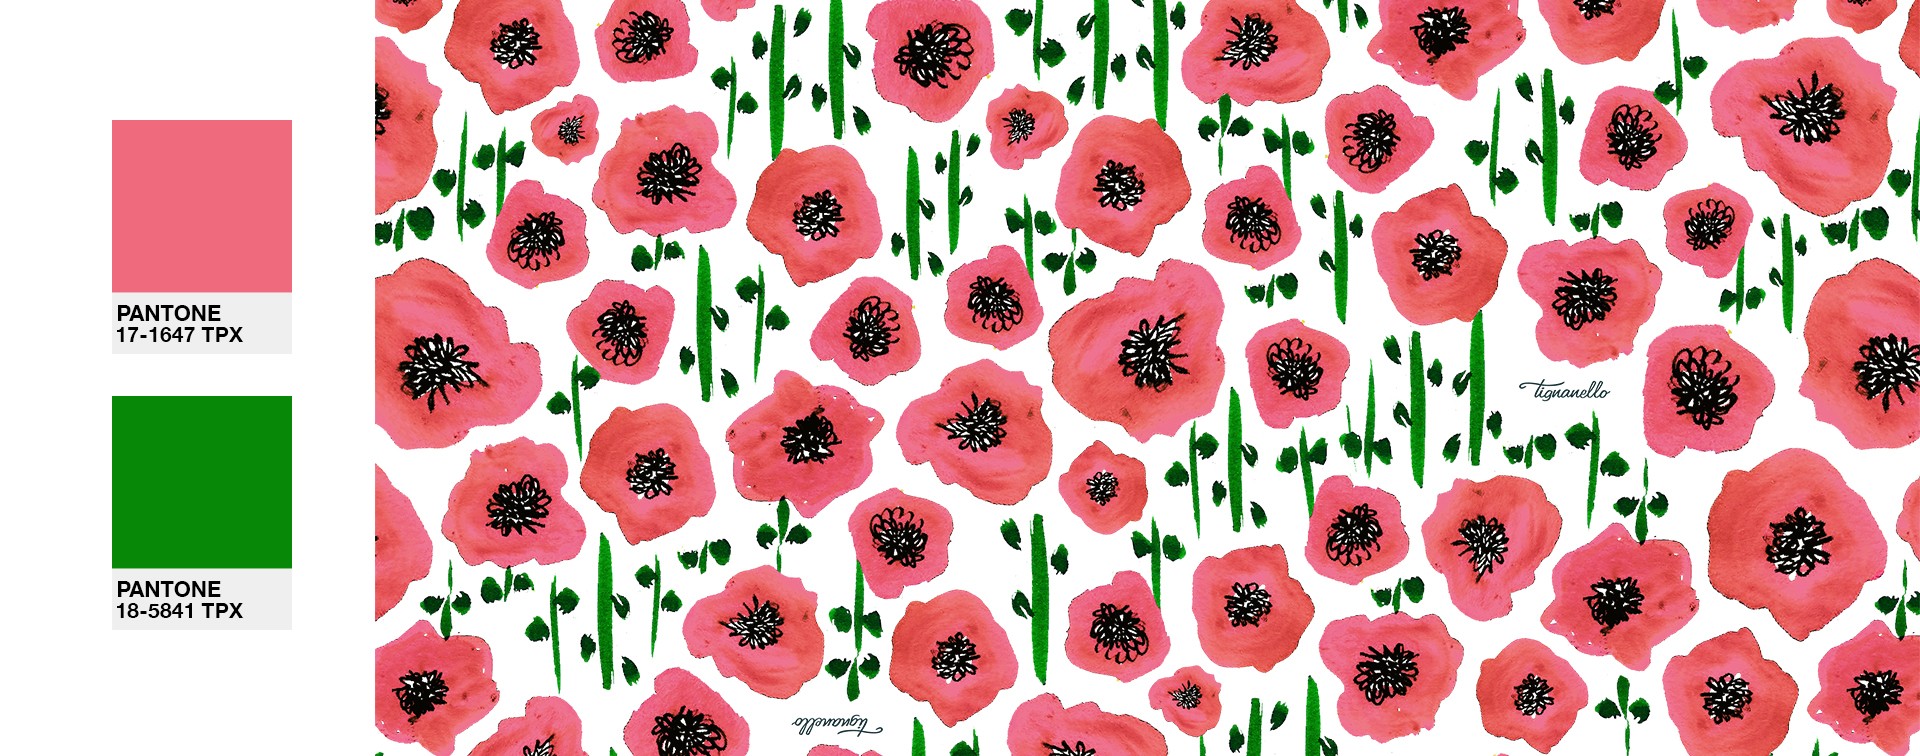 pantone-poppies-straw